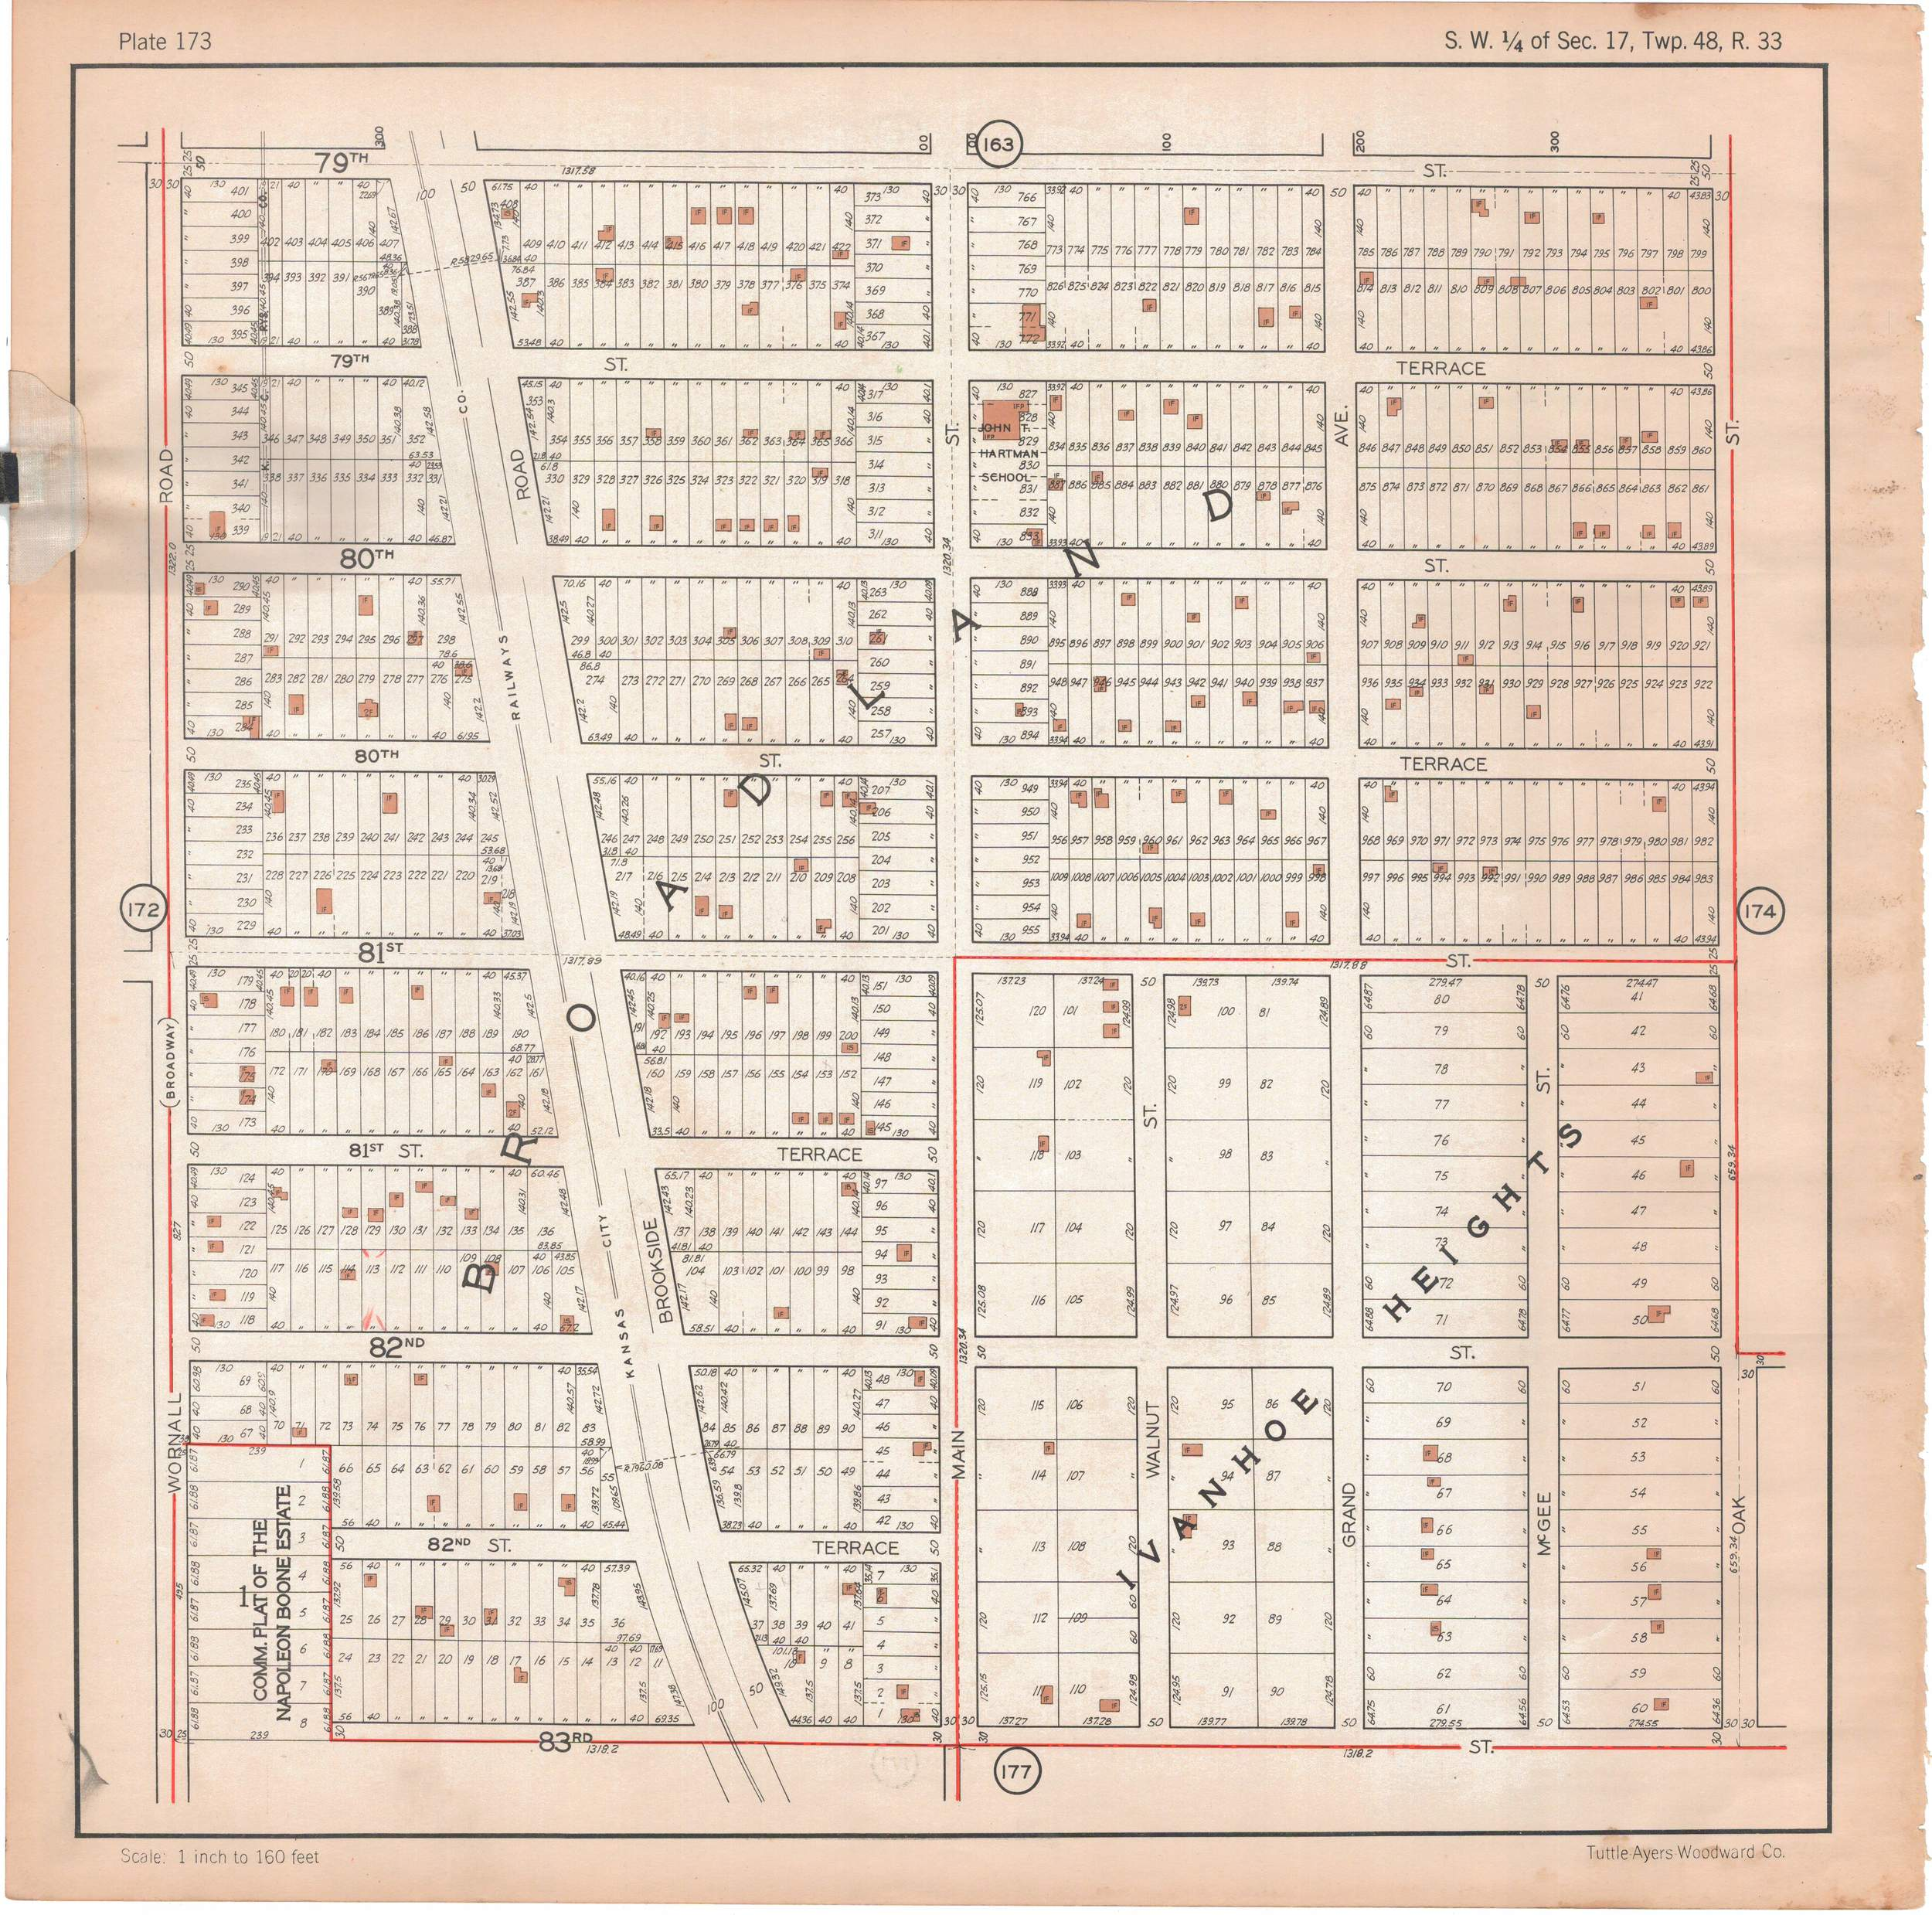 1925 TUTTLE_AYERS_Plate_173.JPG